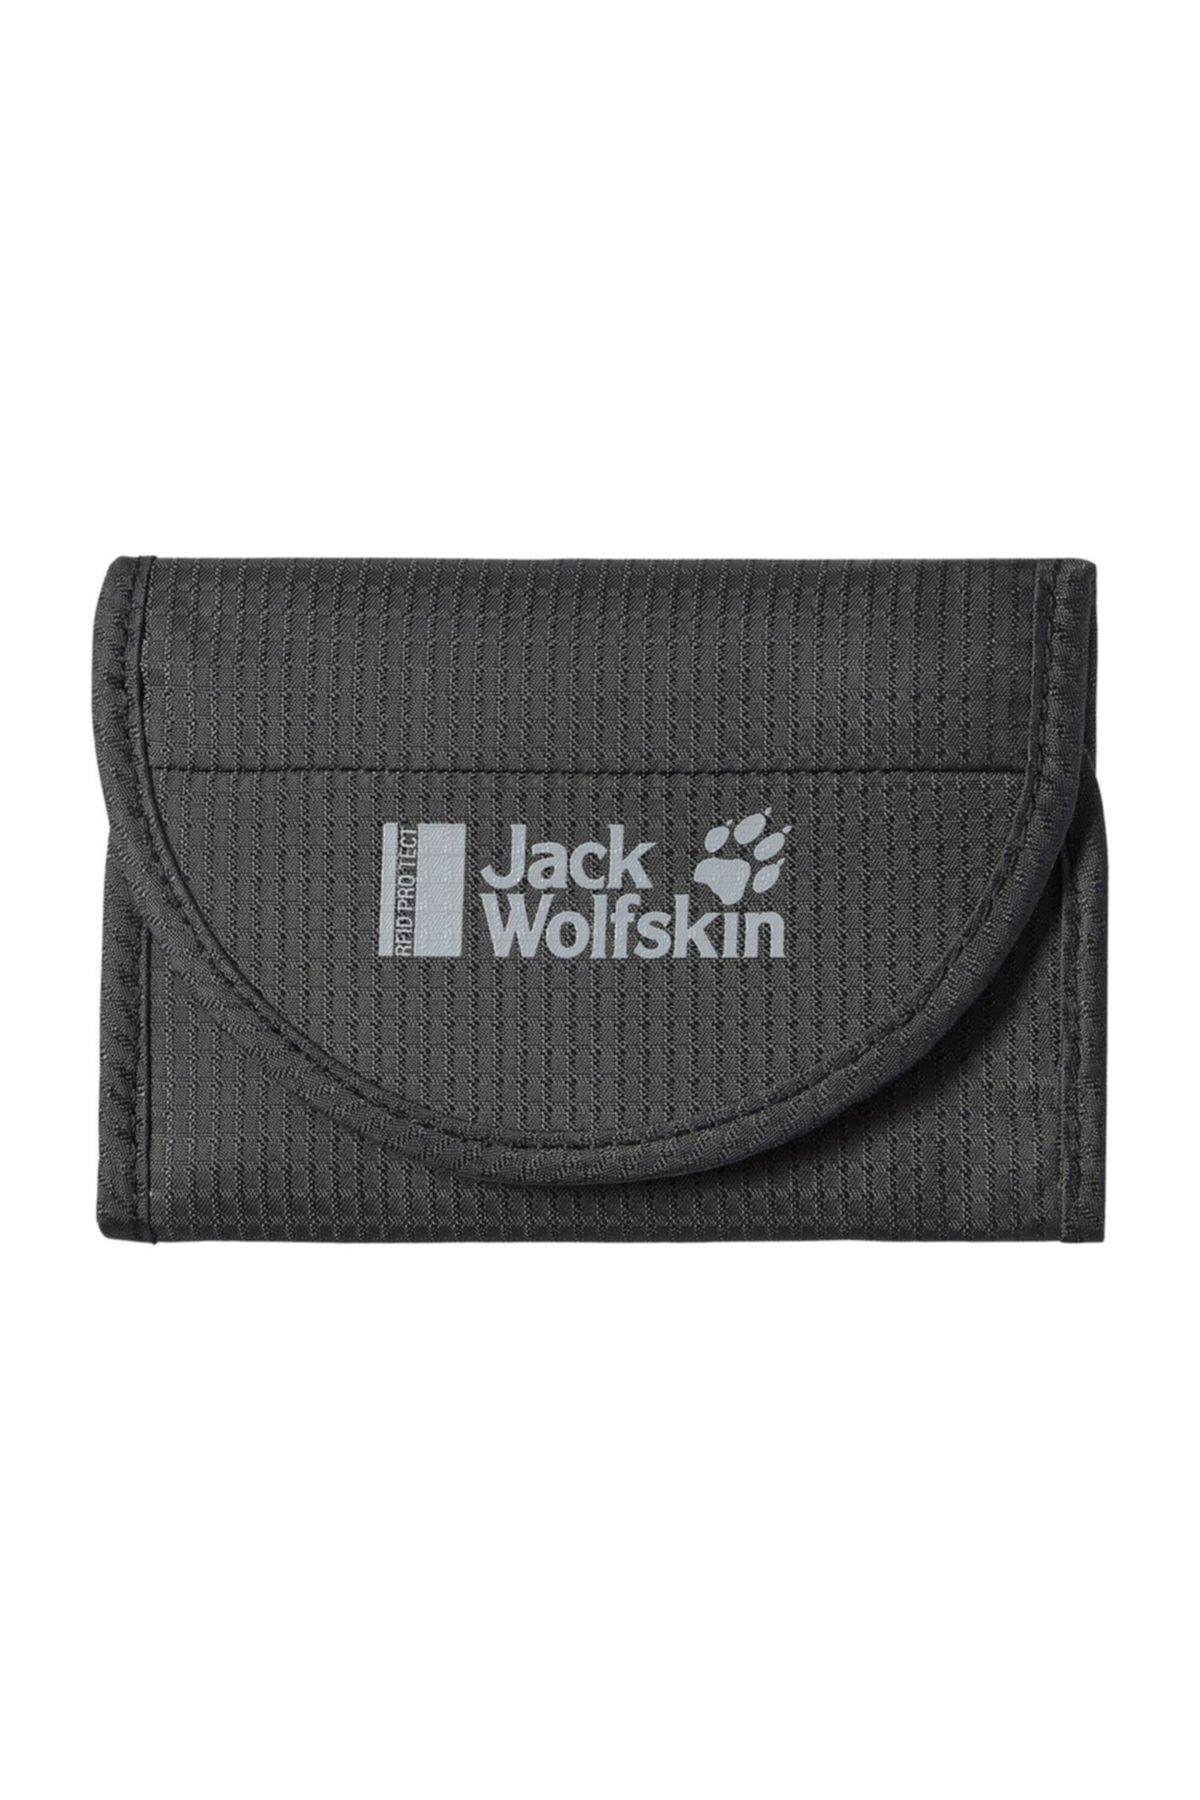 Jack Wolfskin Unisex Cashbag Cüzdan - 8006561-6350 1